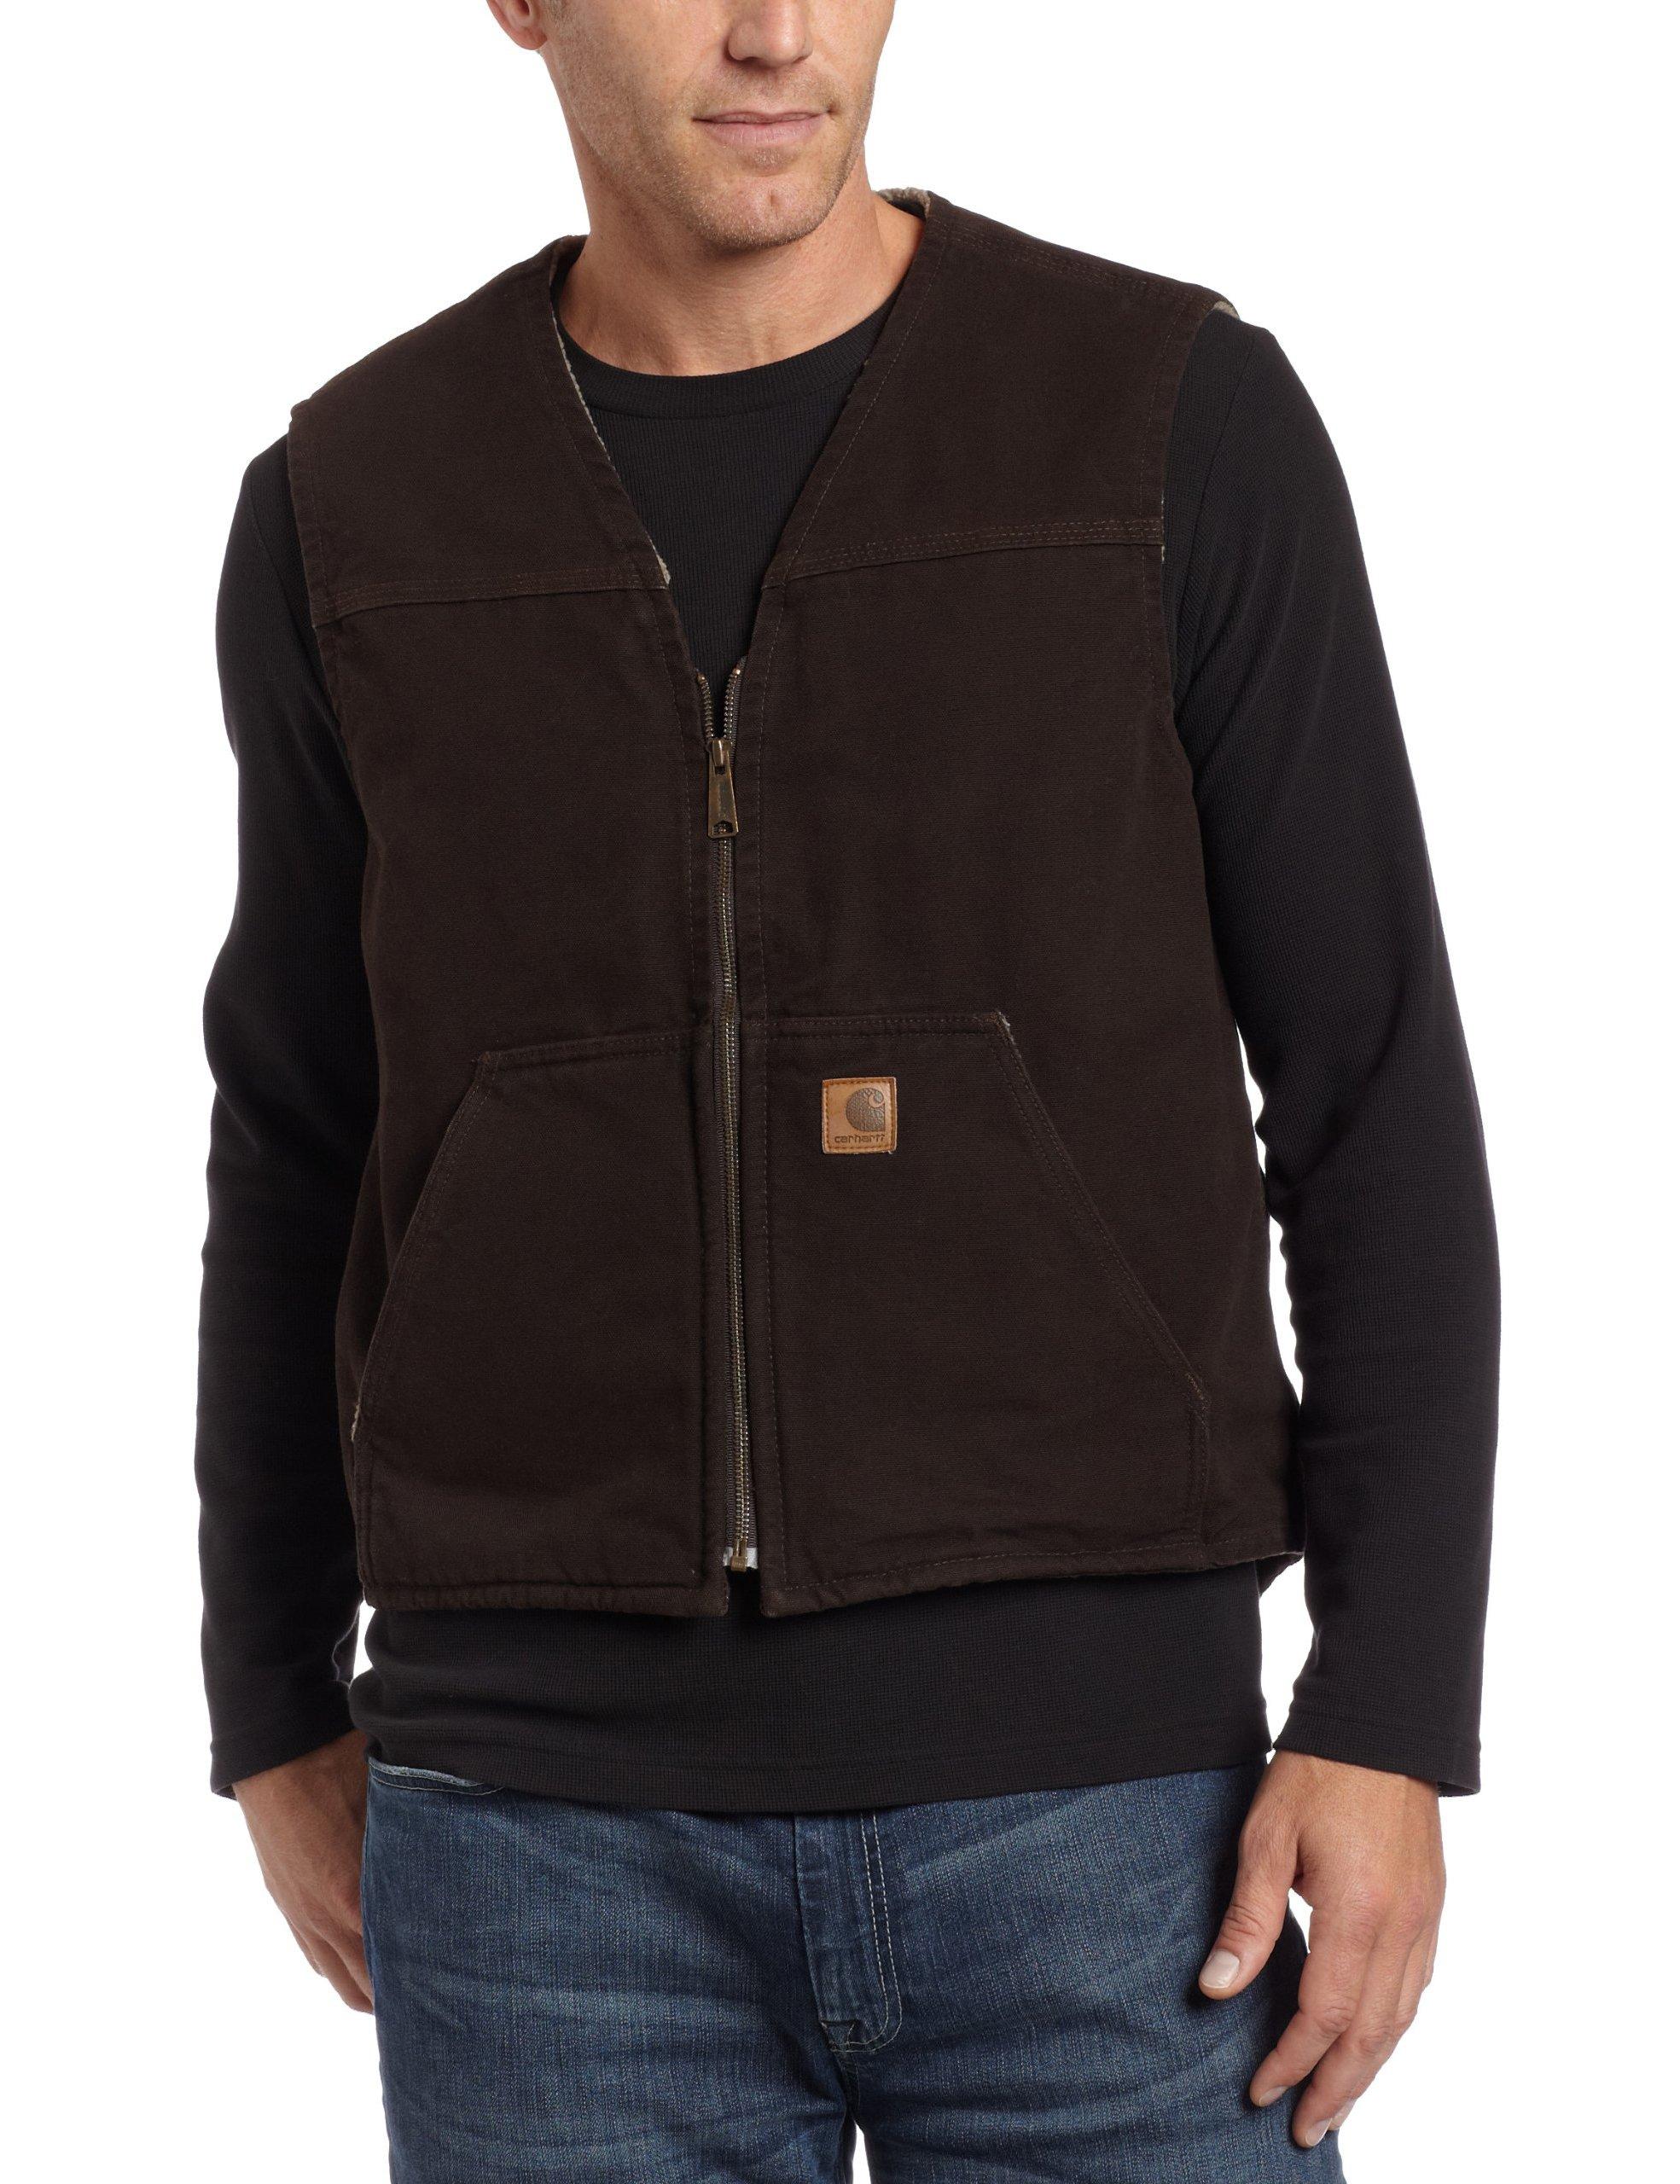 Carhartt Men's Big & Tall Sherpa Lined Sandstone Rugged Vest V26,Dark Brown,XX-Large Tall